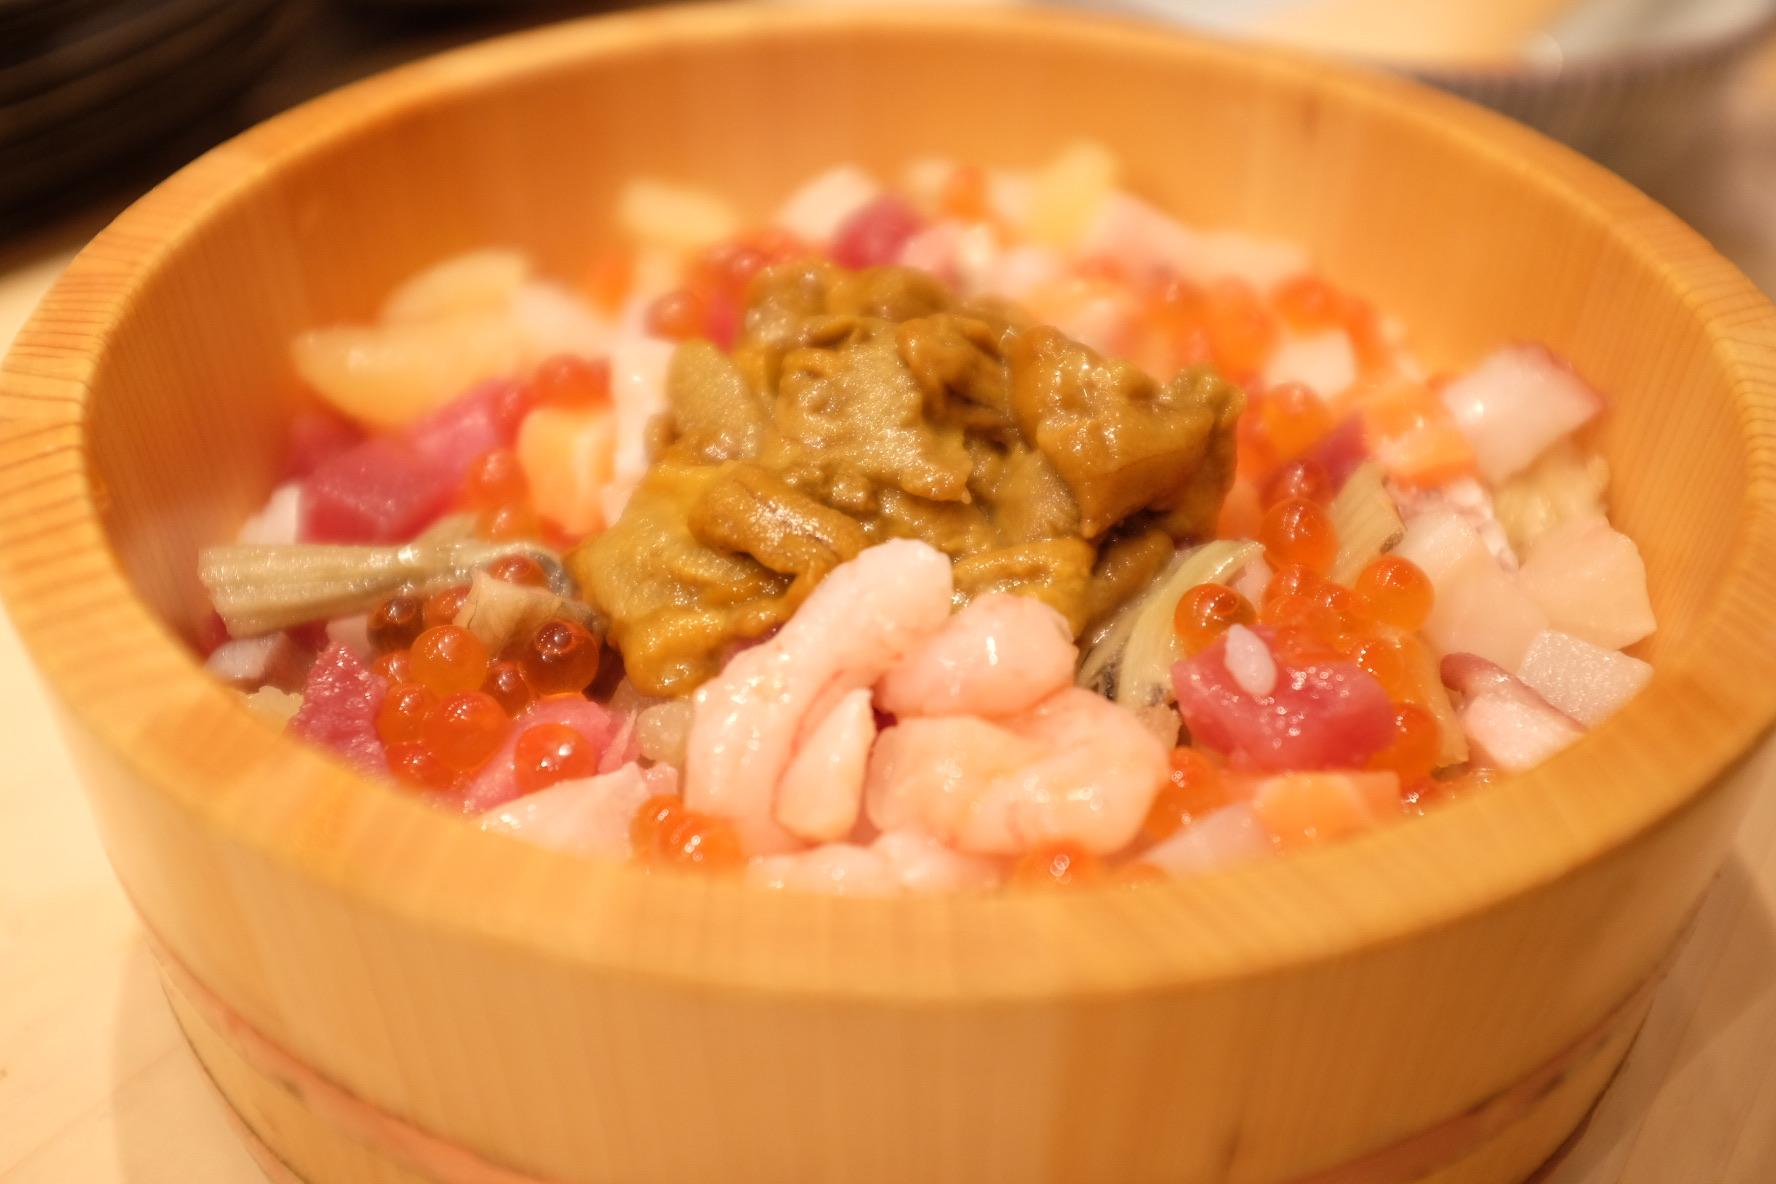 """Sea Urchin, salmon, tuna, yellow tail, salmon roe"" Don. We found it at a small bar in Tsukiji Market, Tokyo."